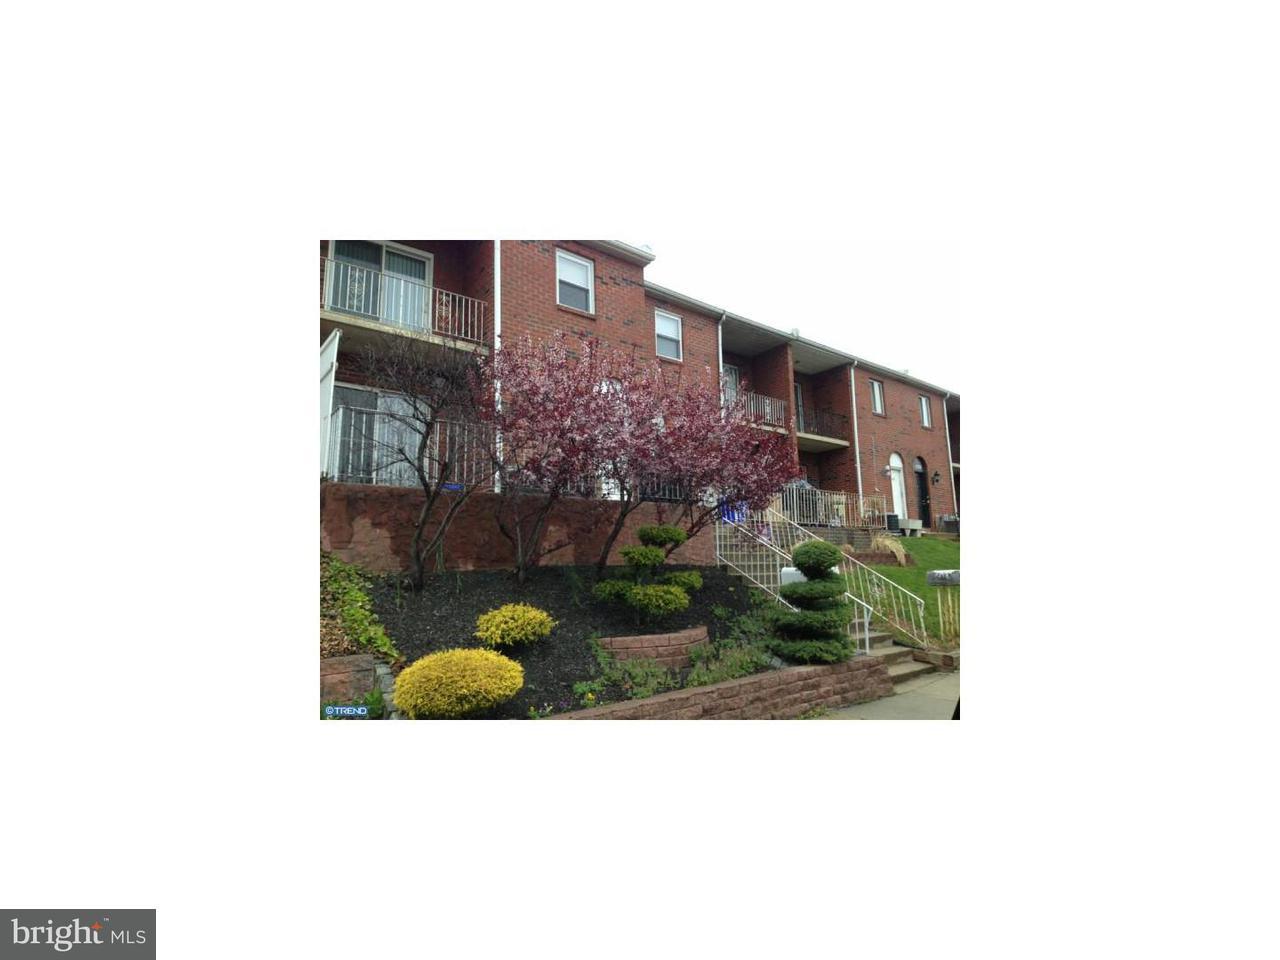 Single Family Home for Rent at 9168 ELLIE Drive Philadelphia, Pennsylvania 19114 United States